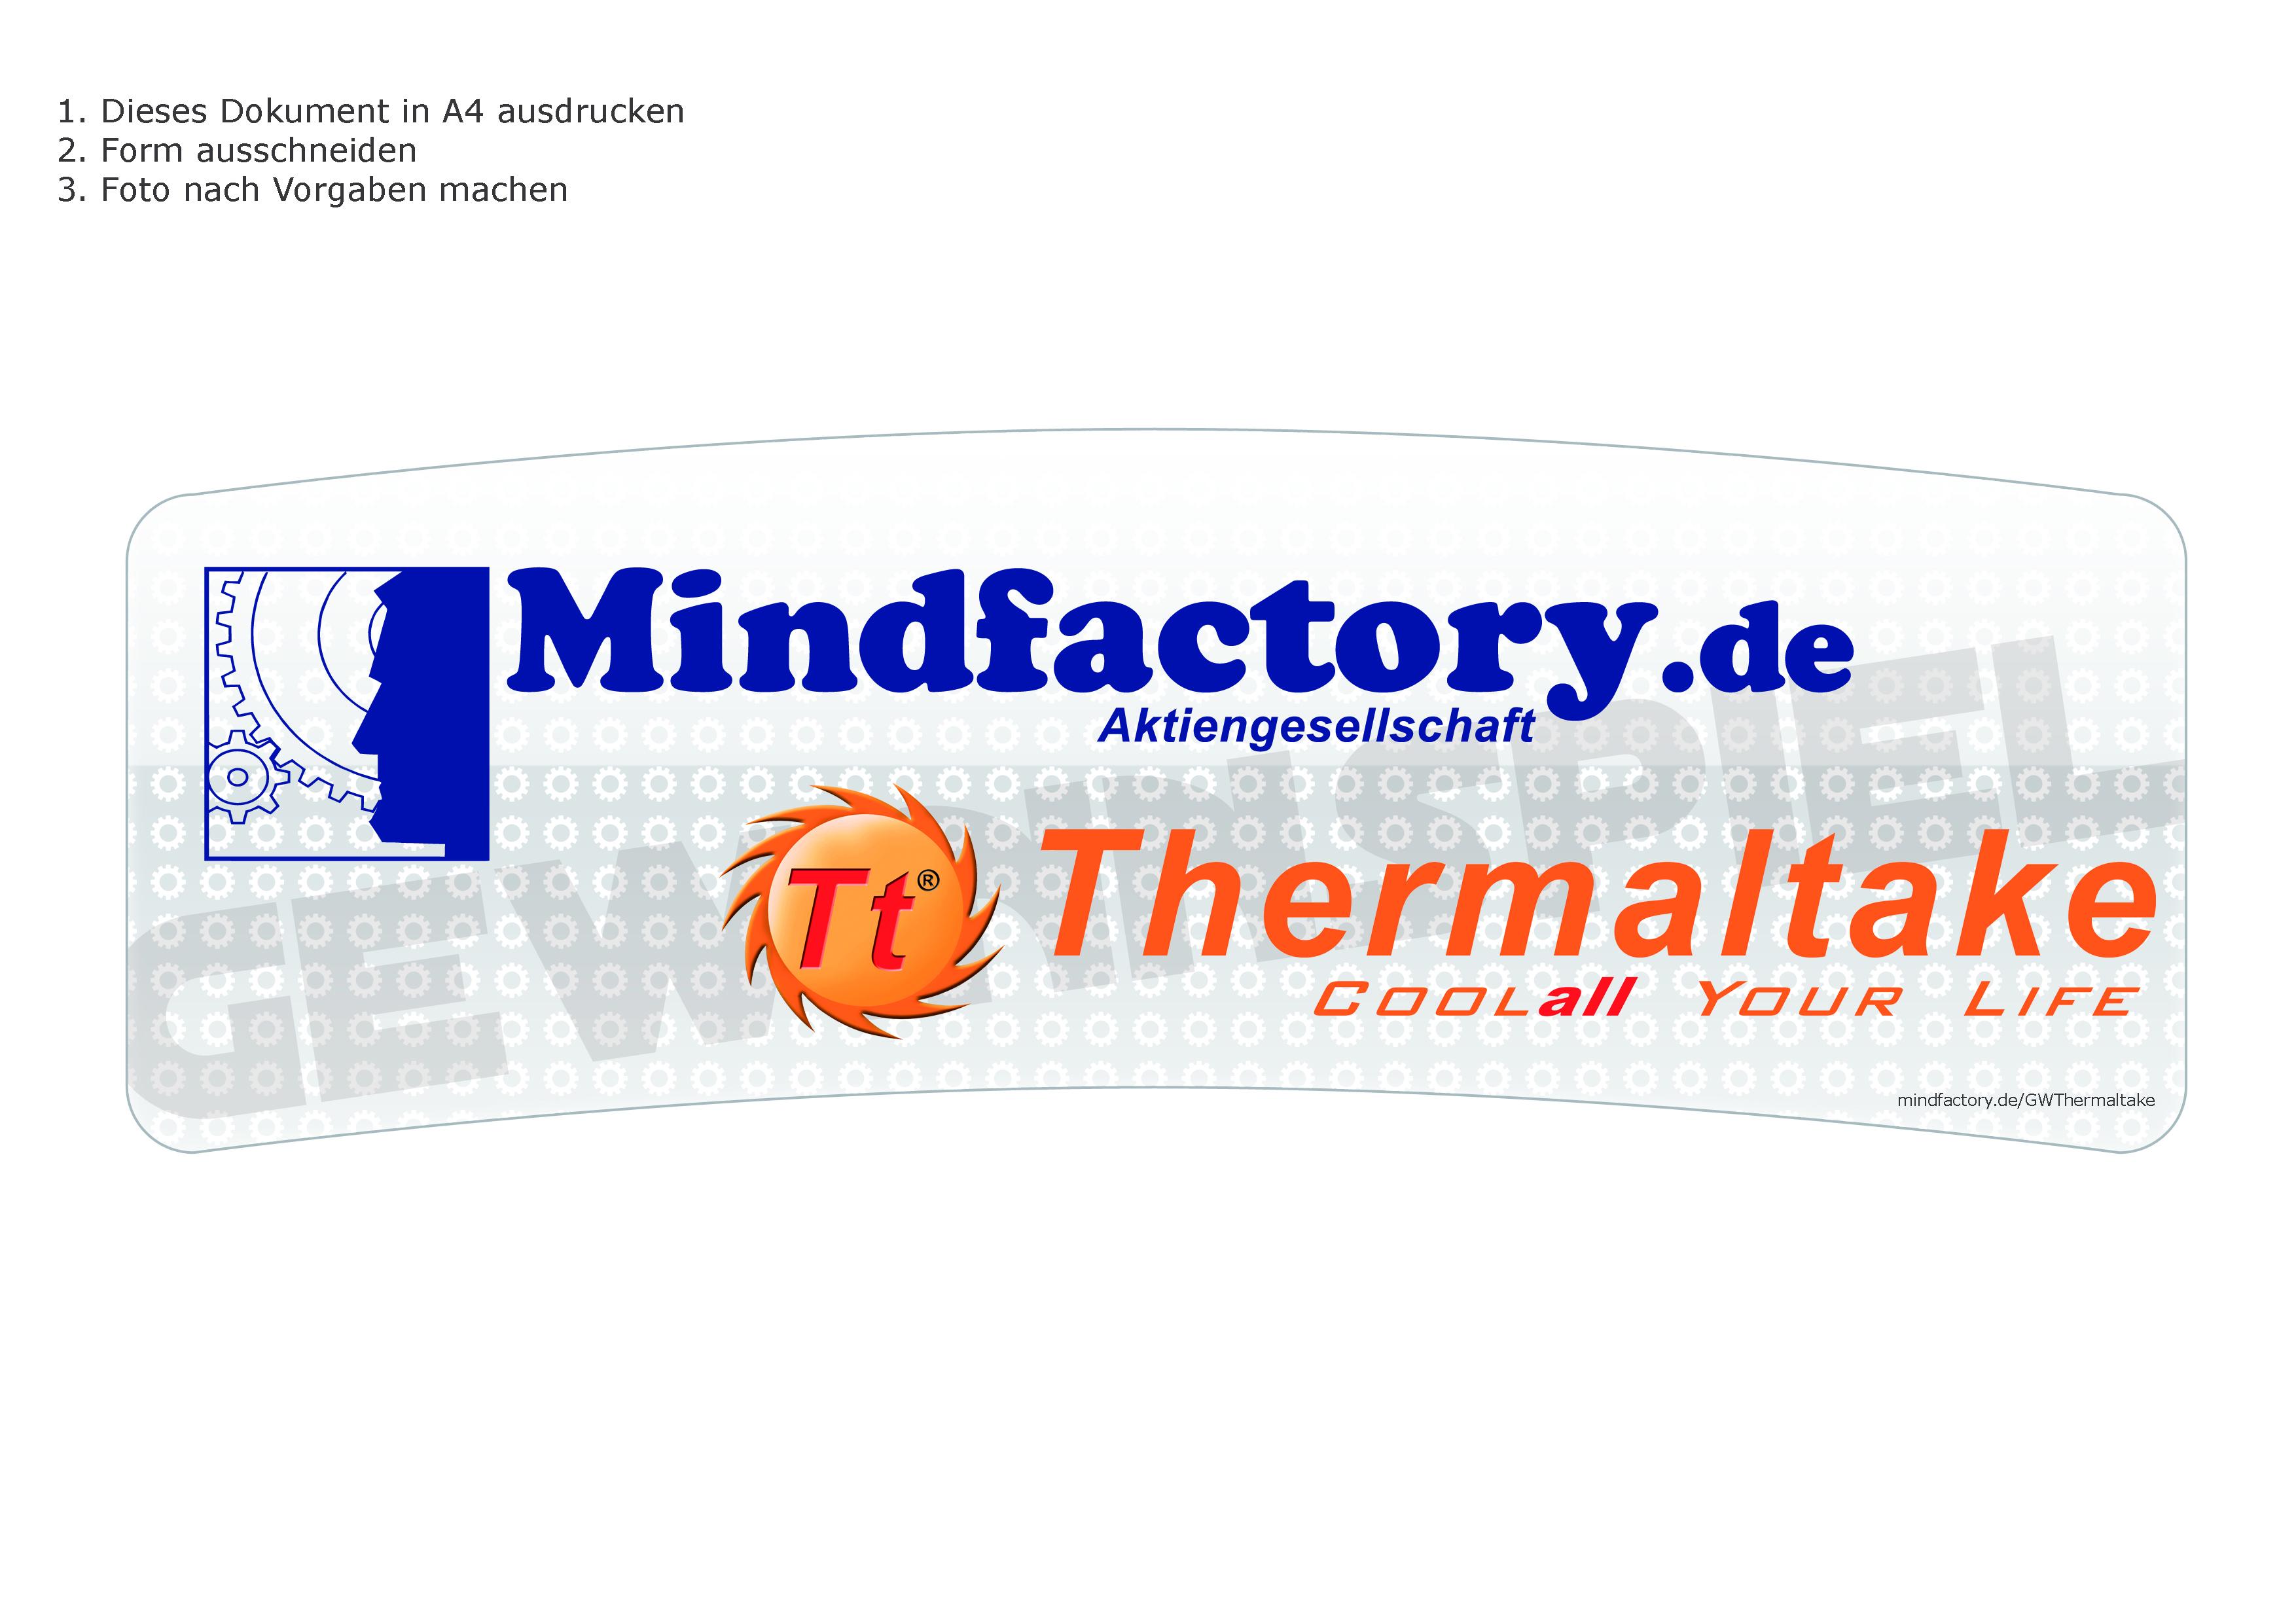 Thermaltake Gewinnspiel   Mindfactory.de - Hardware, Notebooks ...